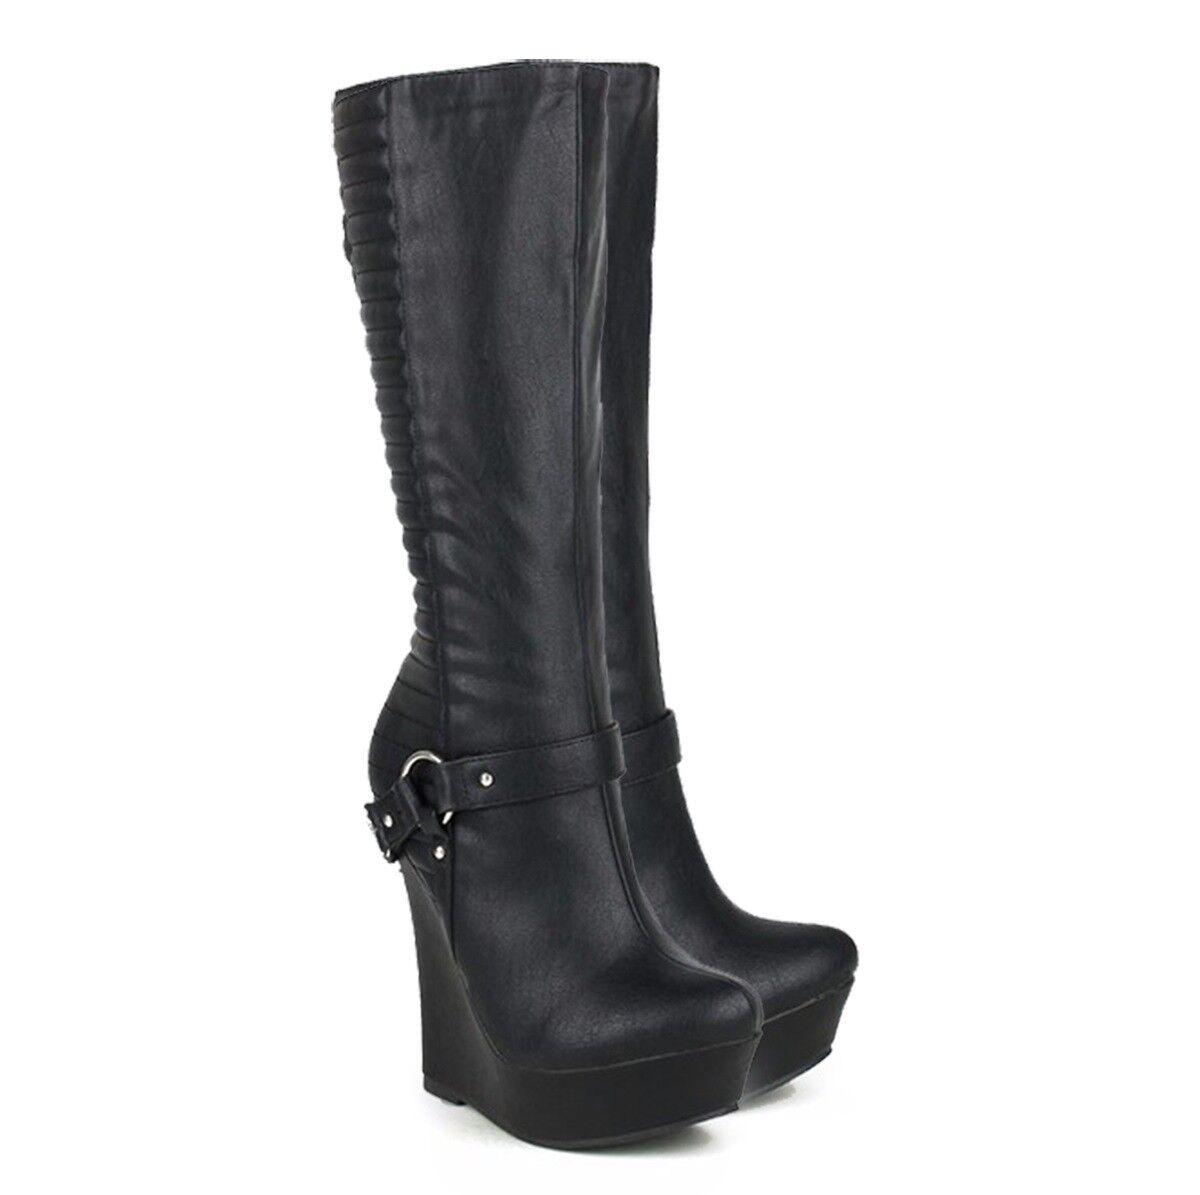 Women's Punk Mid-Calf Boots Platform Wedge High High High Heels Round Toe Buckle shoes 8914d2